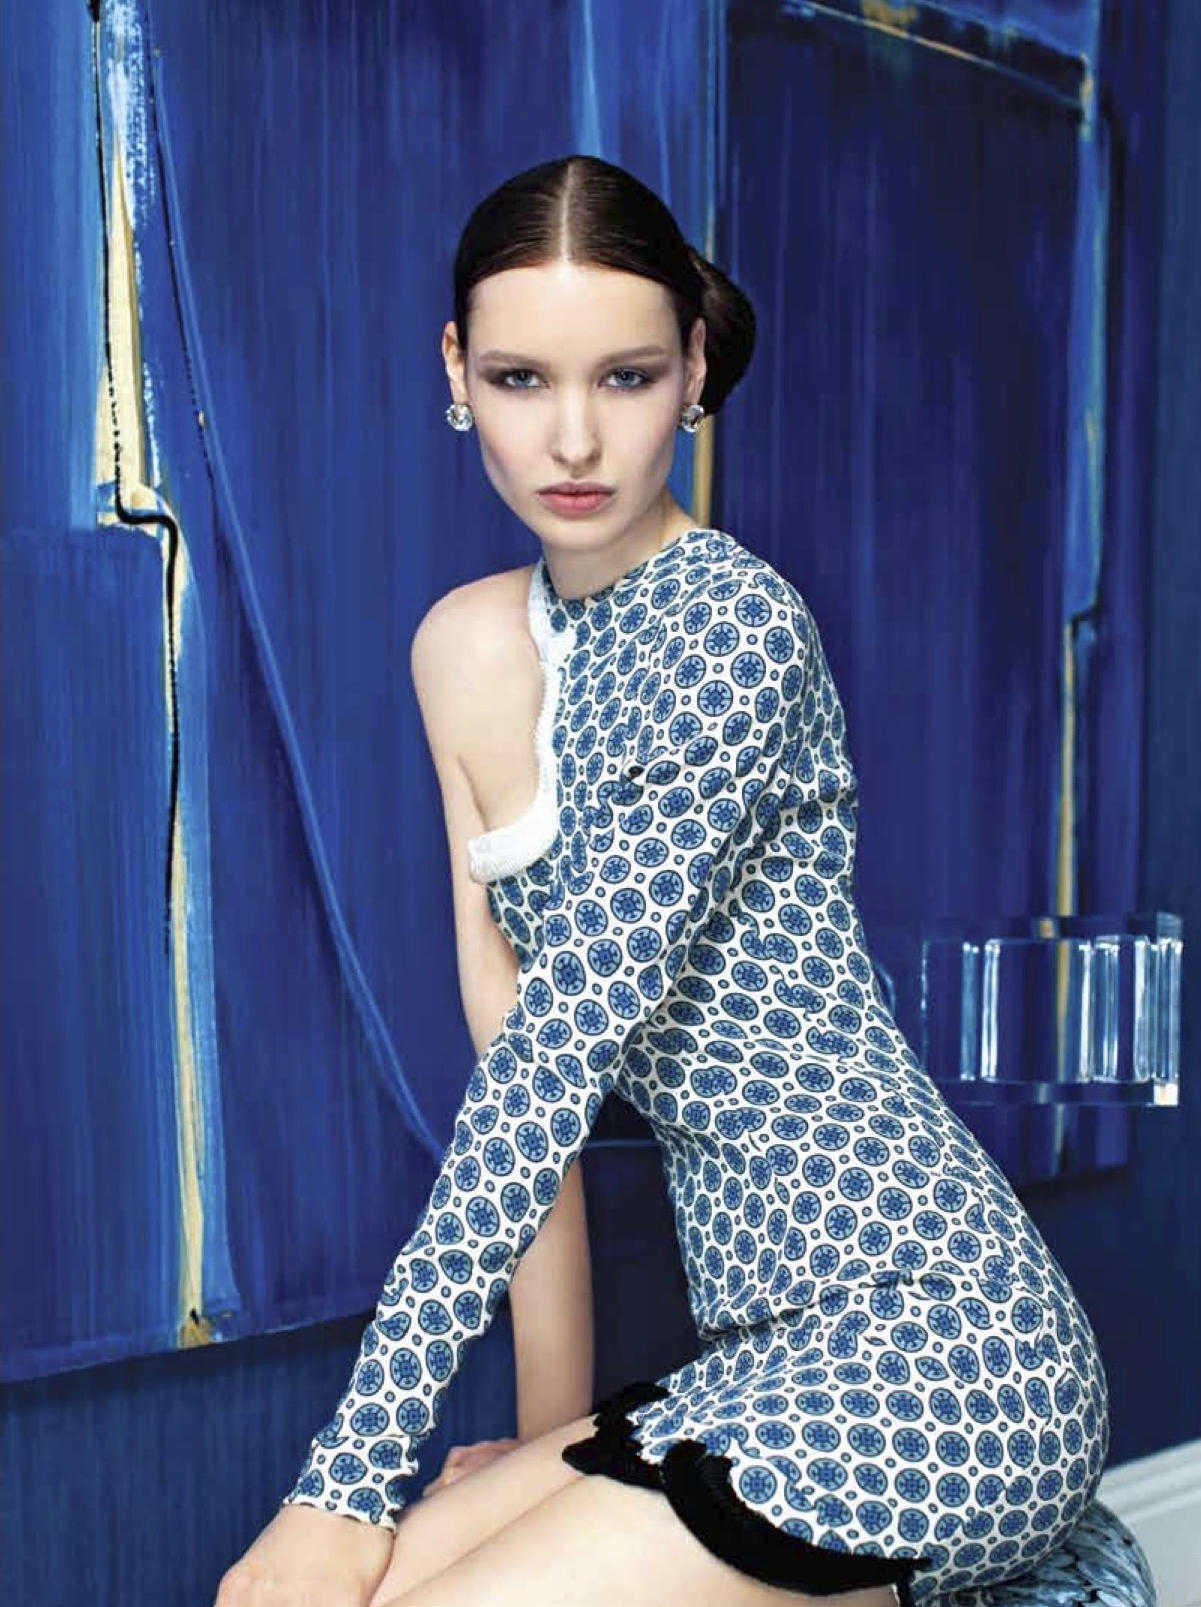 PBI_Fashion 5.jpg